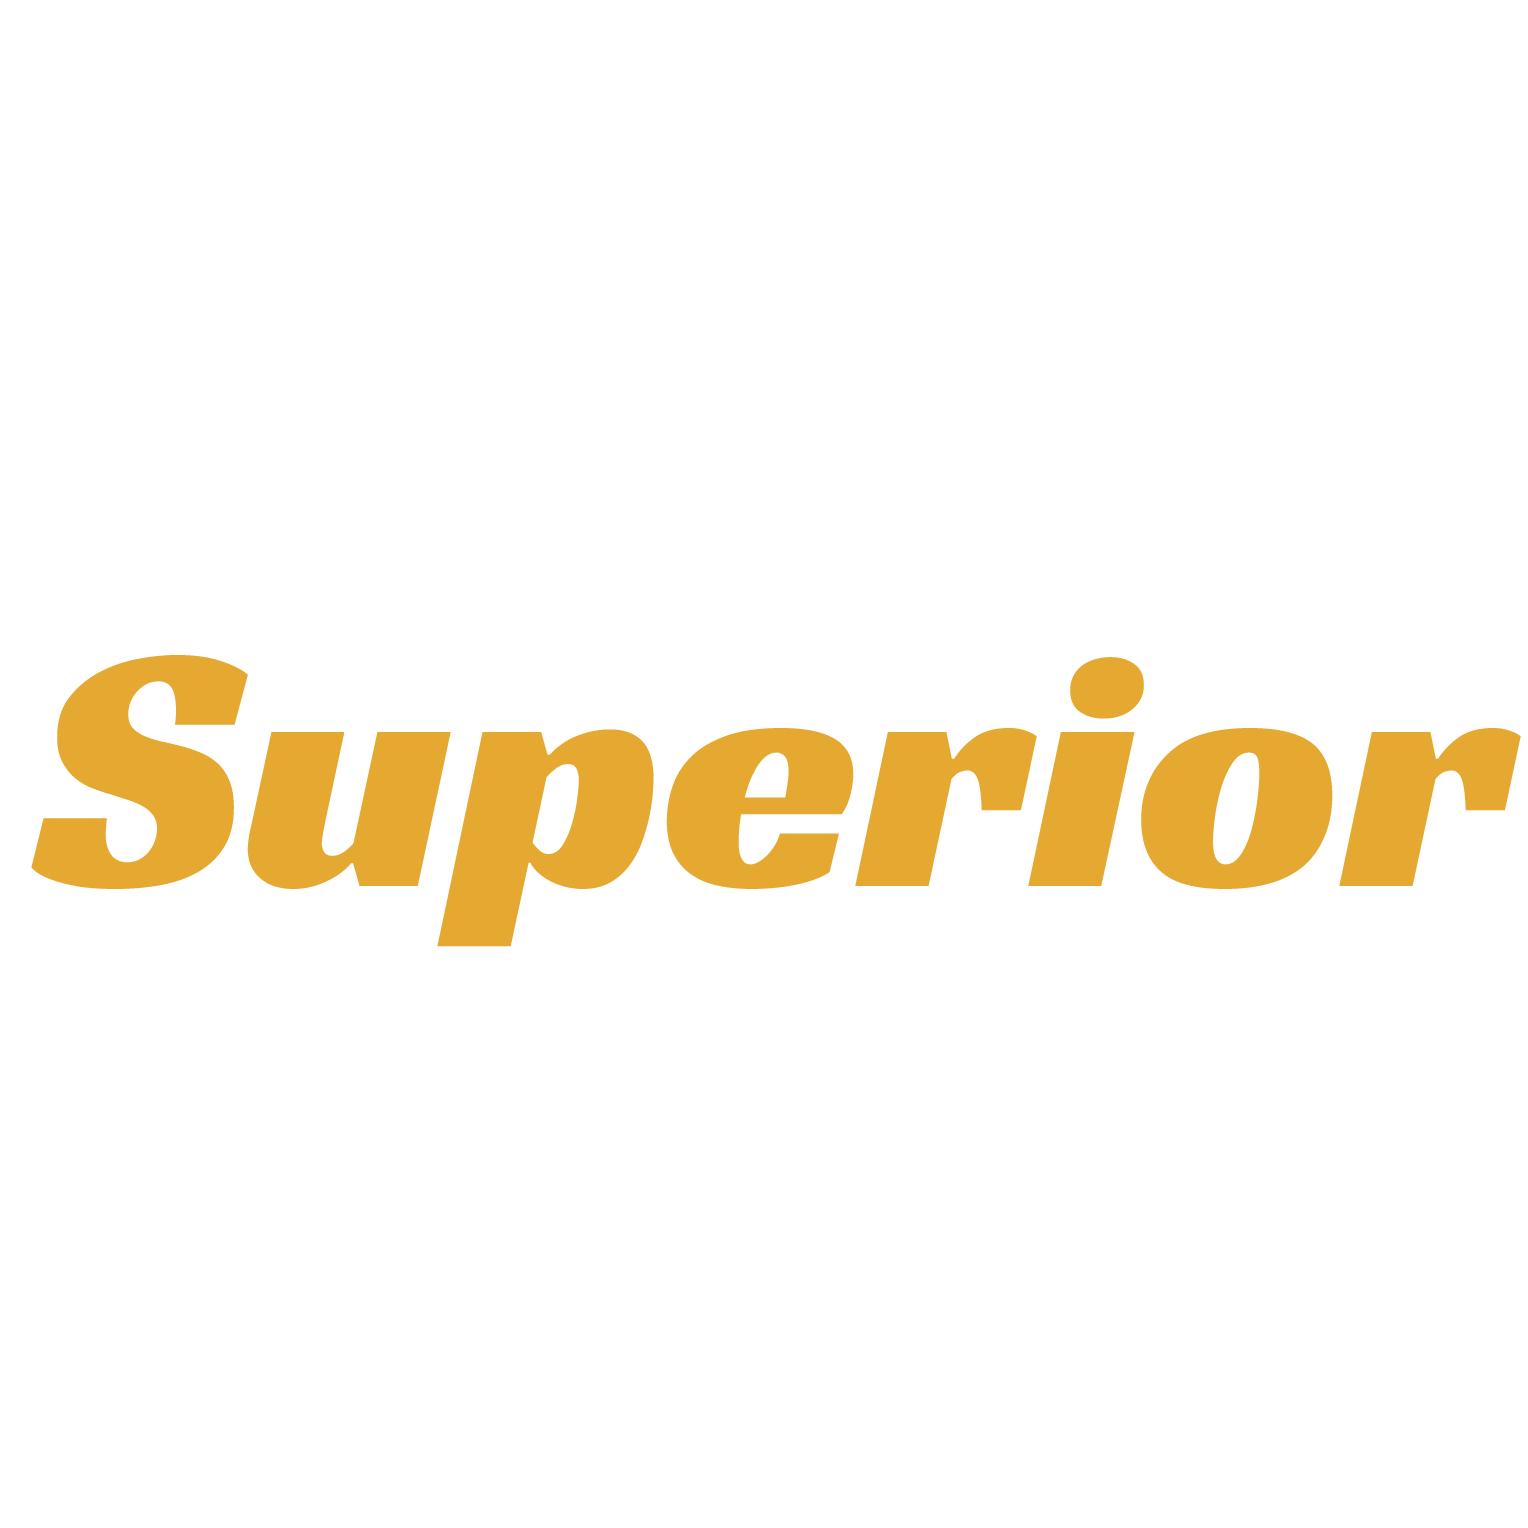 Superior Truck Service, Inc.